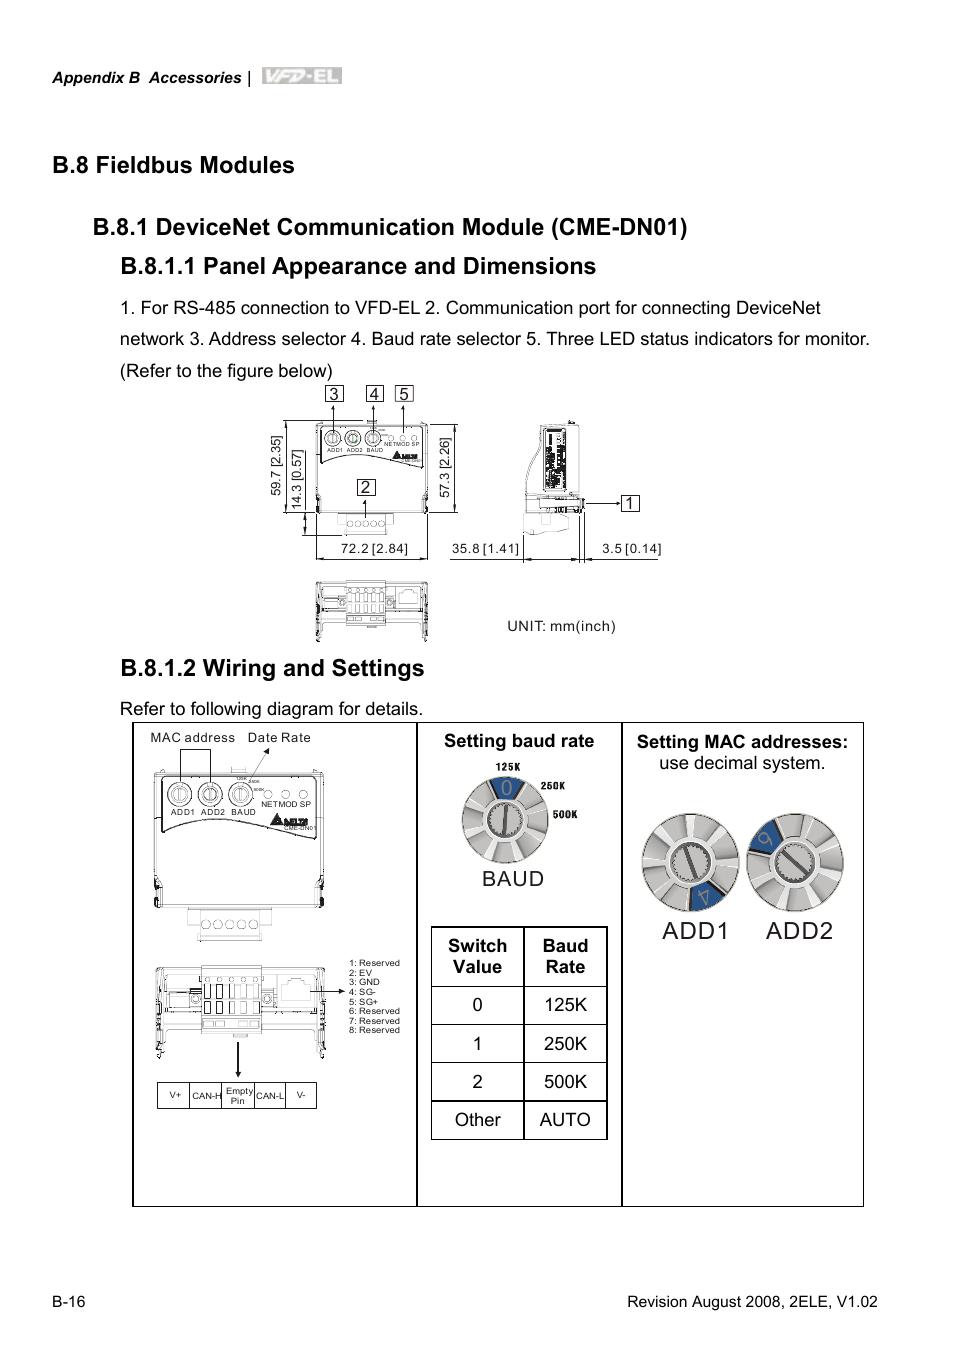 hight resolution of b 8 fieldbus modules b 8 1 devicenet communication module cme dn01 delta vfd el wiring diagram